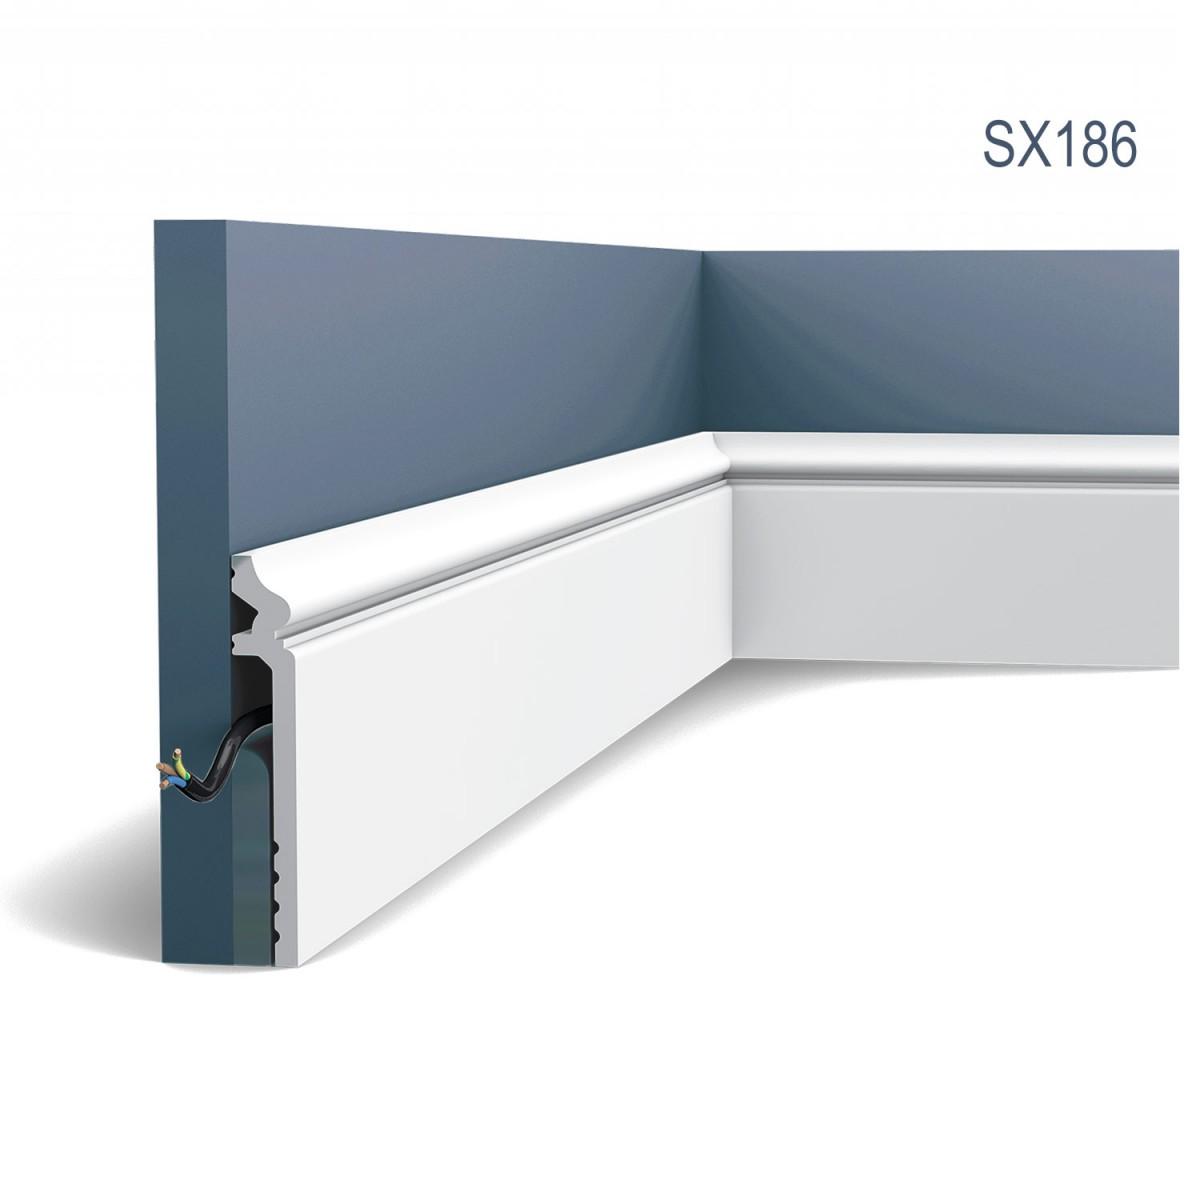 Plinta Luxxus SX186, Dimensiuni: 200 X 2.2 X 13.8 cm, Orac Decor